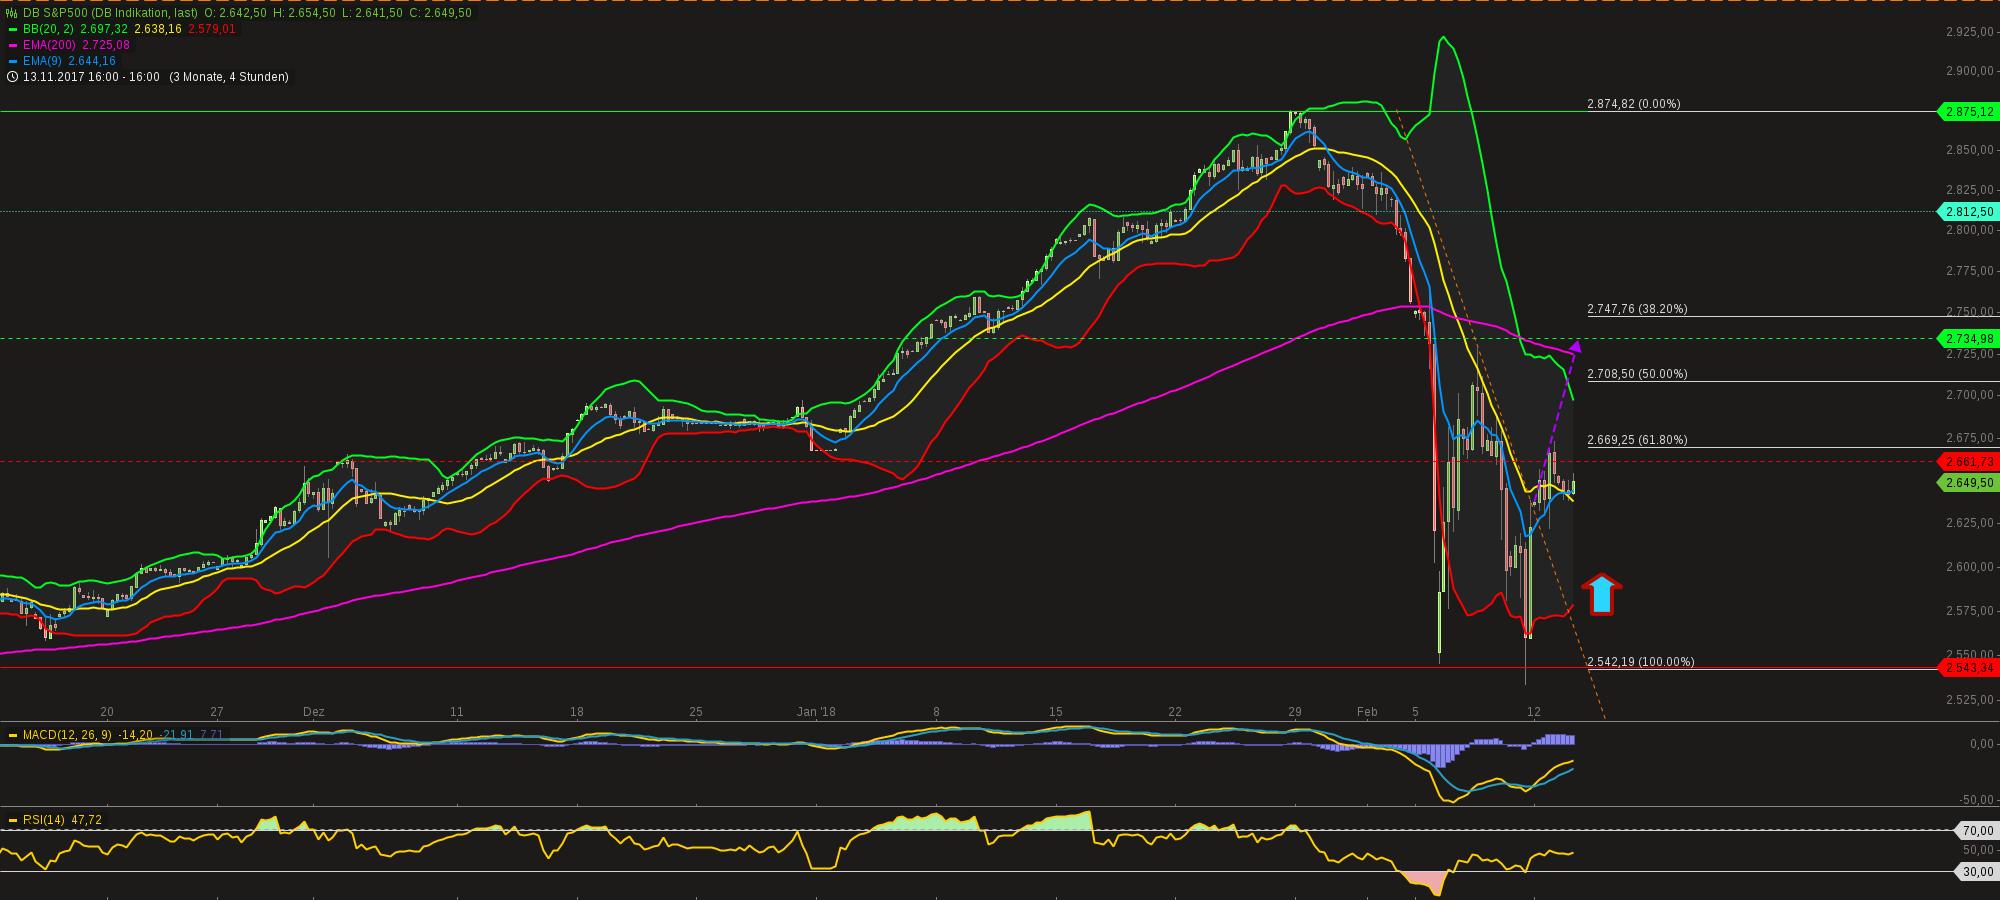 chart-13022018-1857-dbsp.png